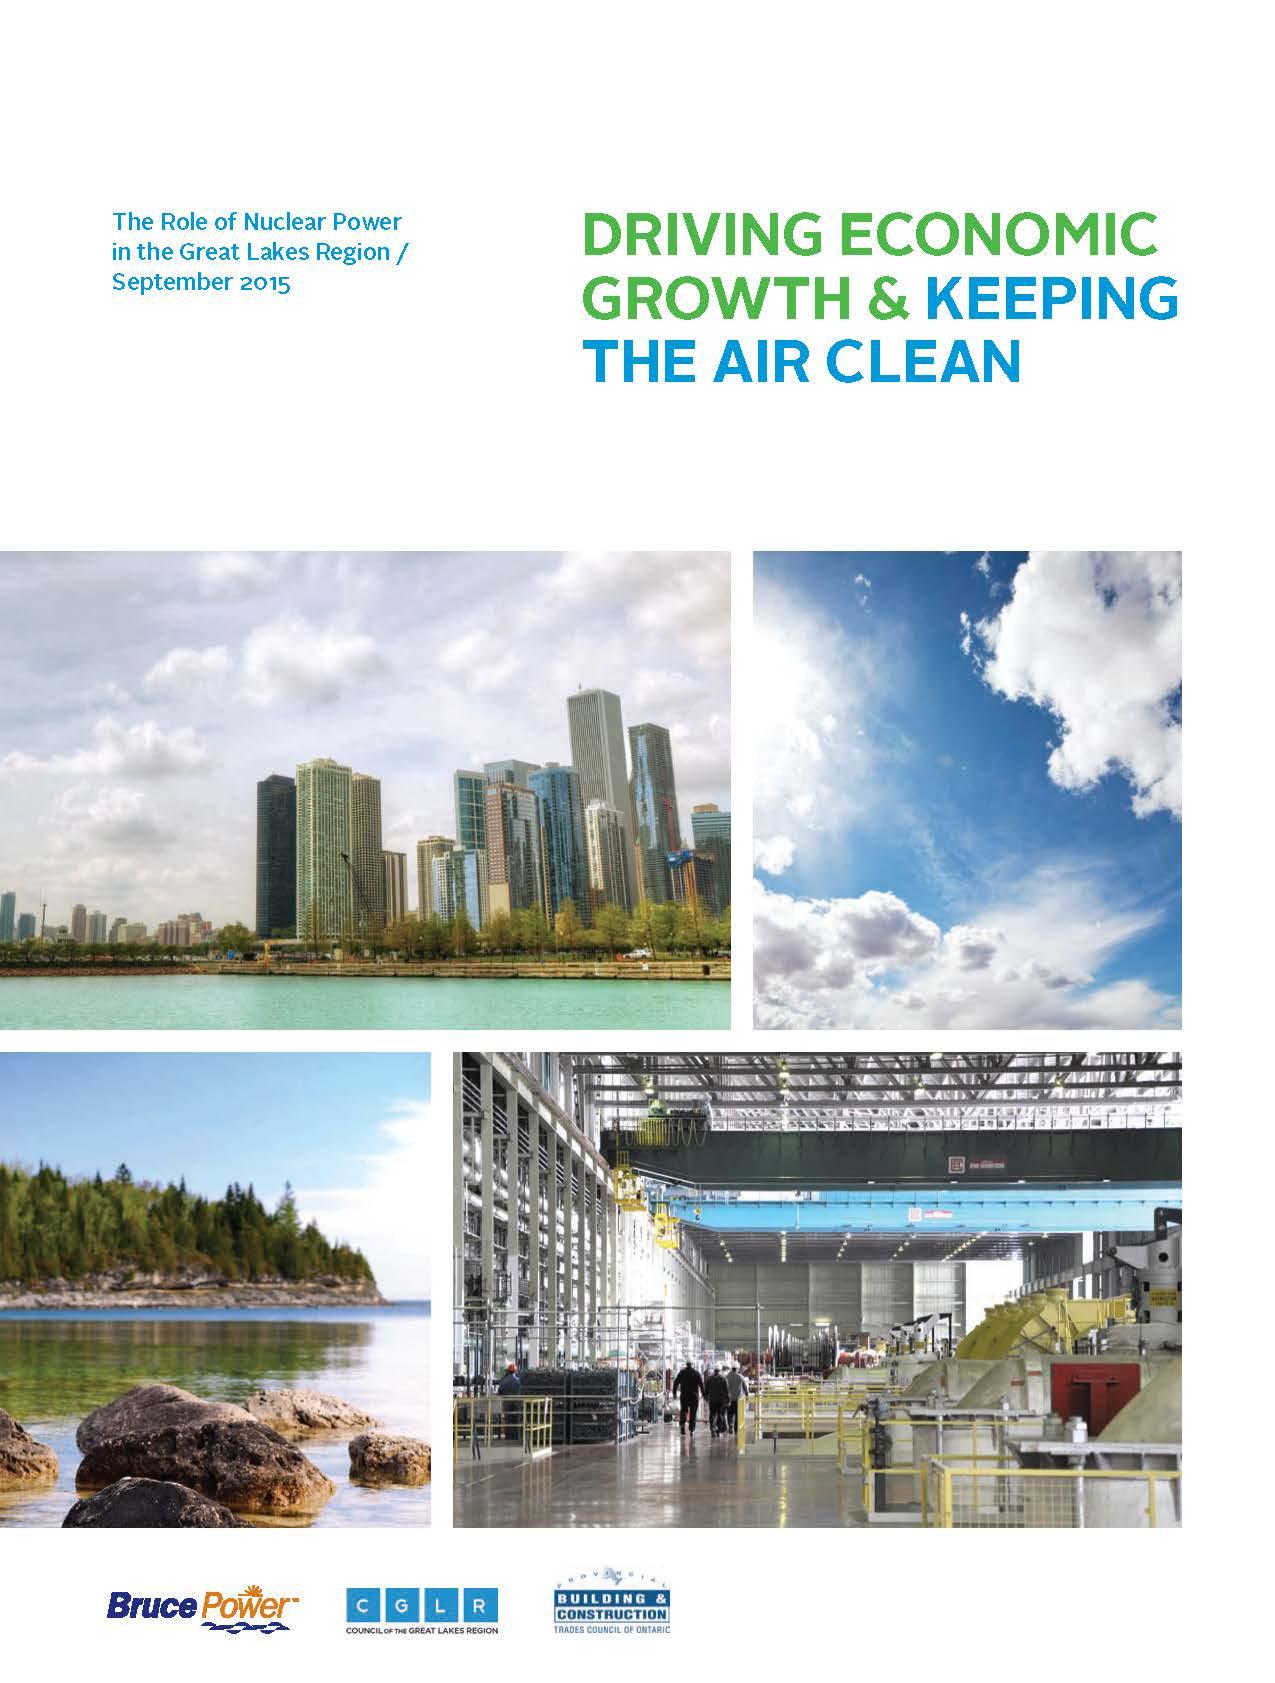 DrivingEconomicGrowth_cover